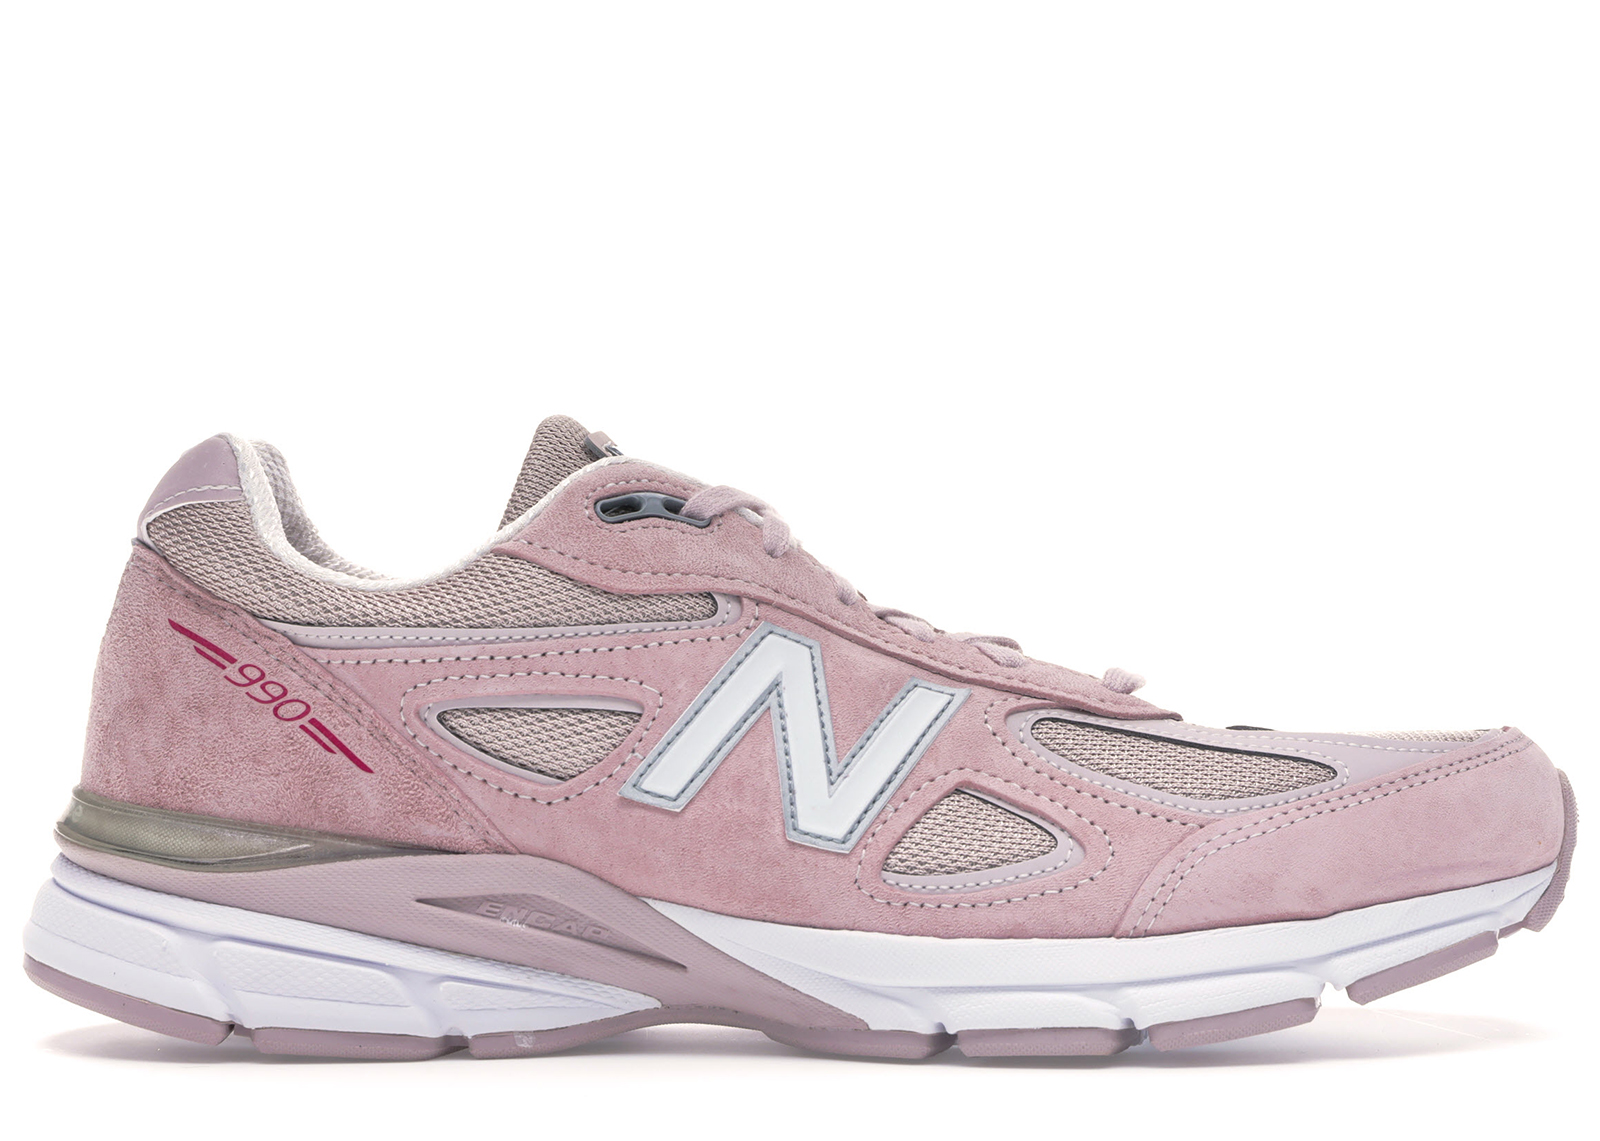 New Balance 990v4 Pink Ribbon (Faded Rose) - M990KMN4